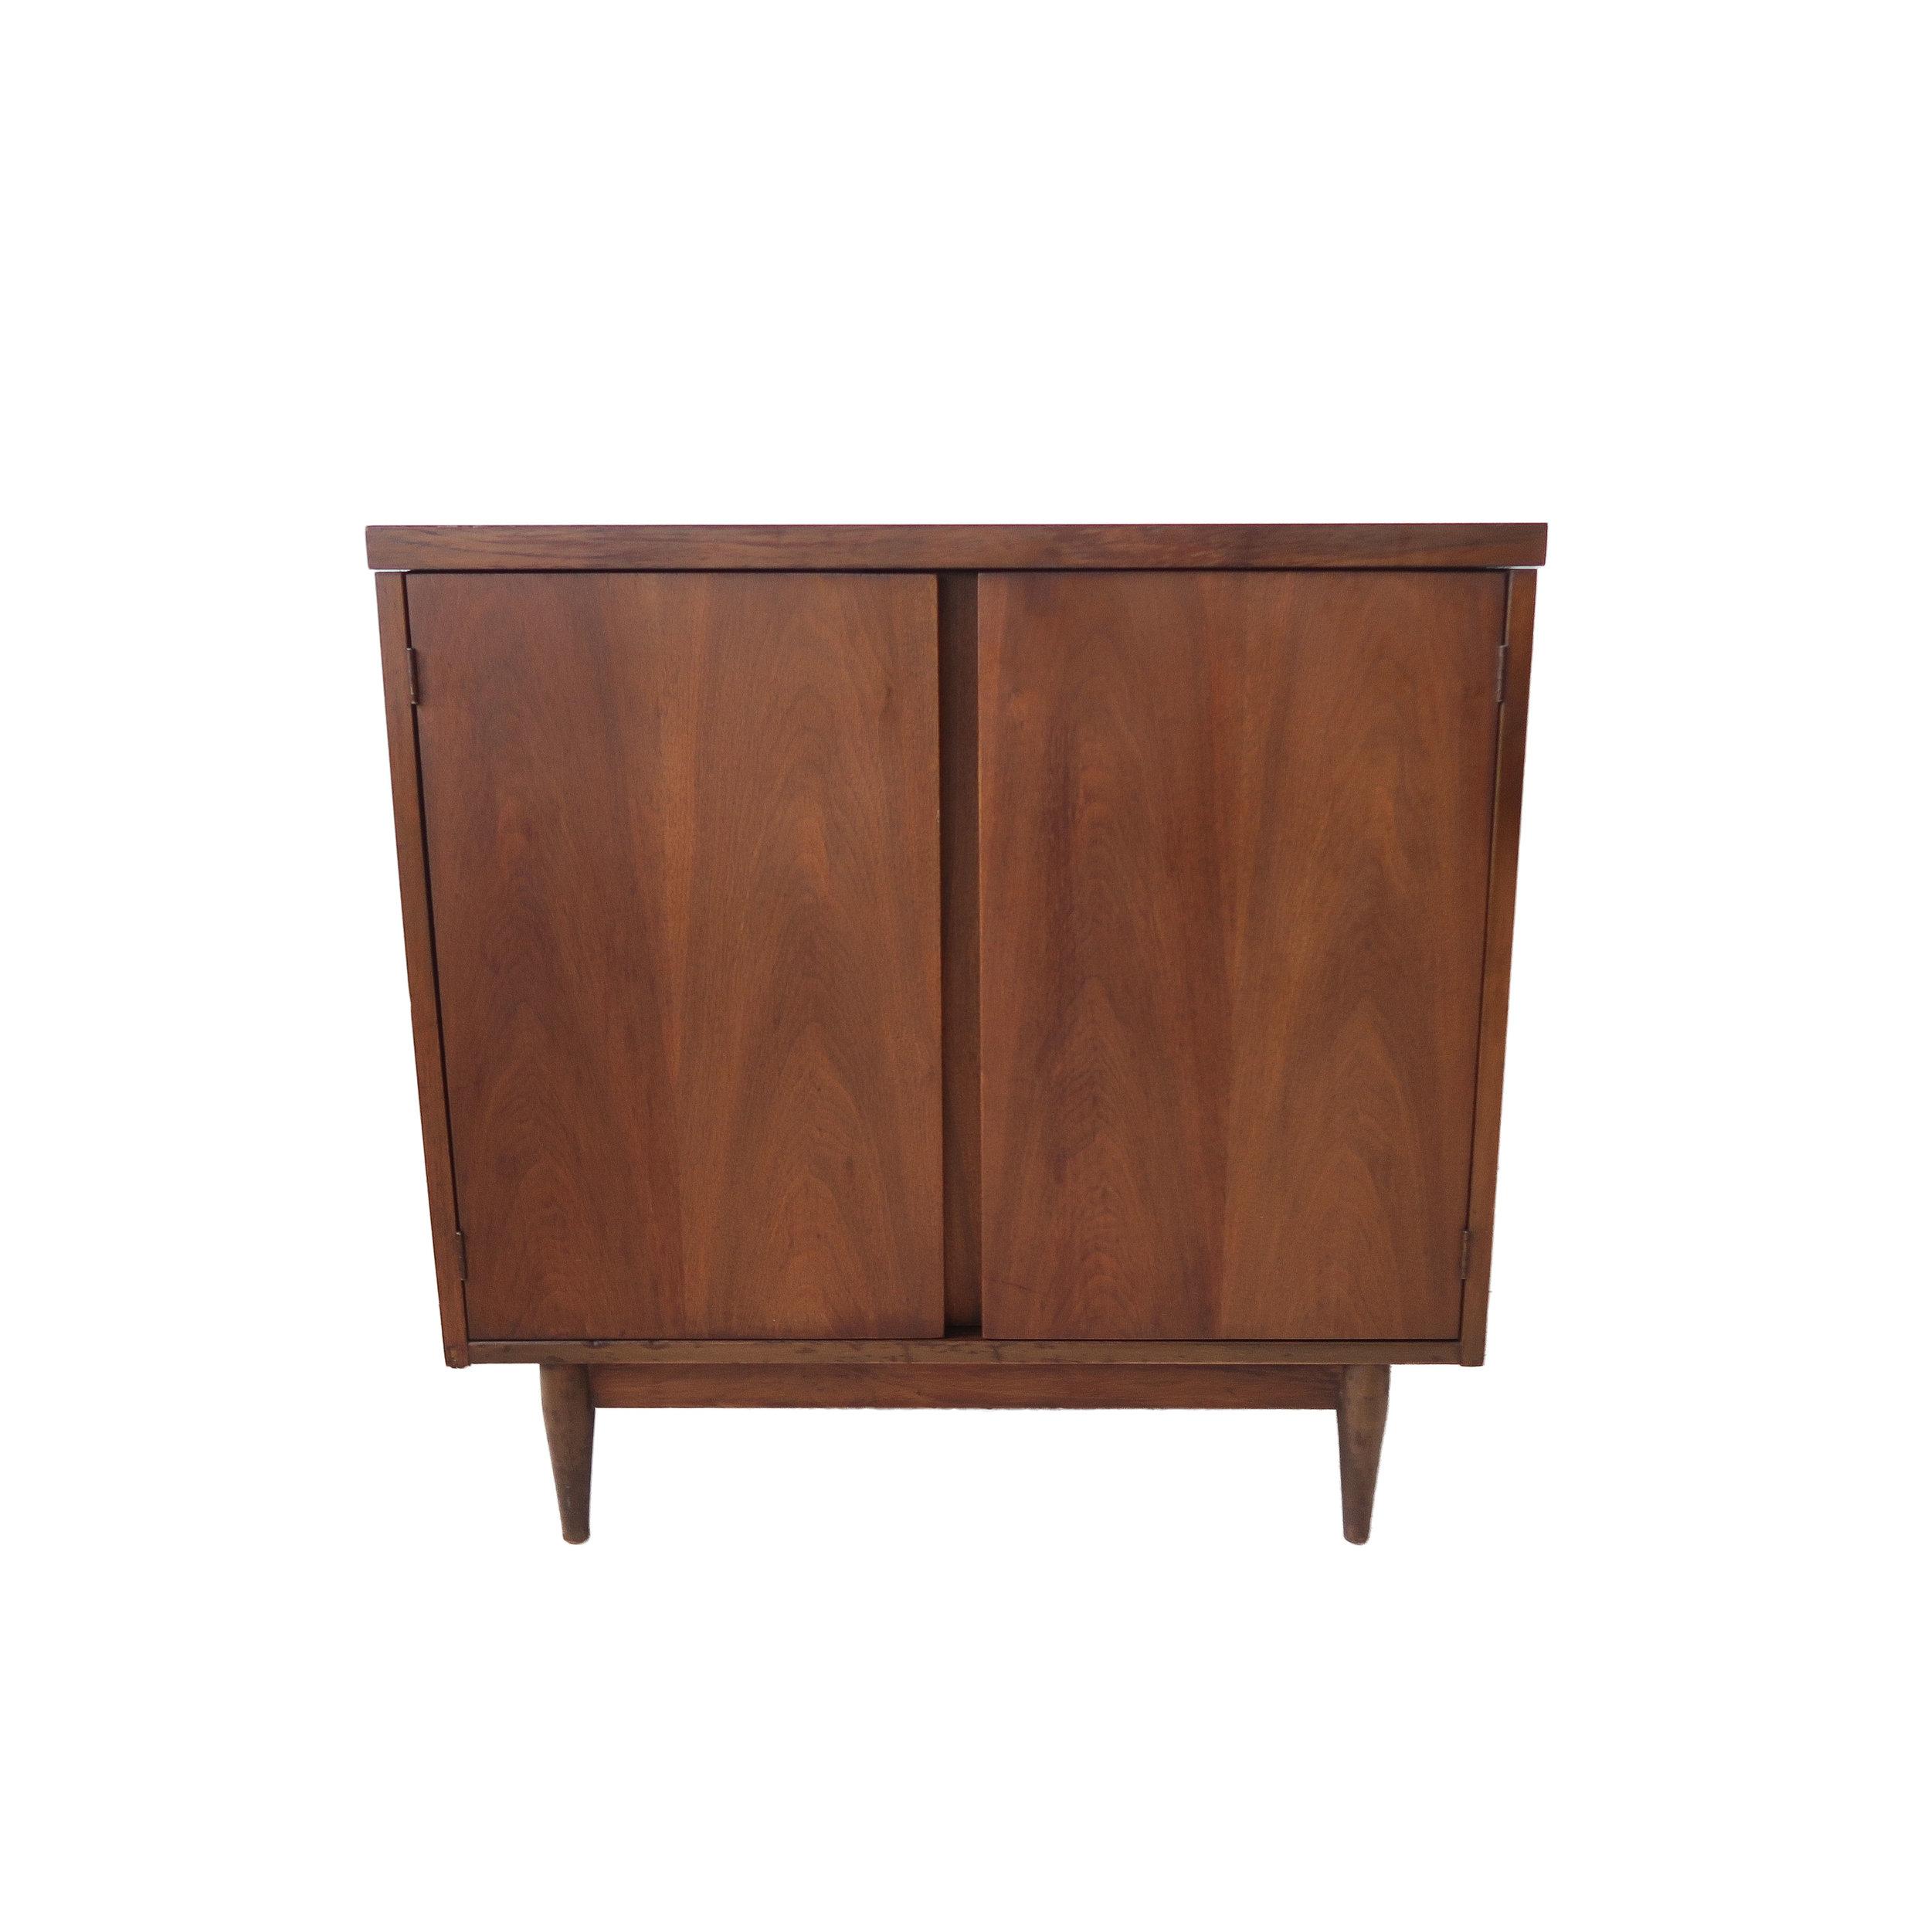 mid century modern cabinet.jpg